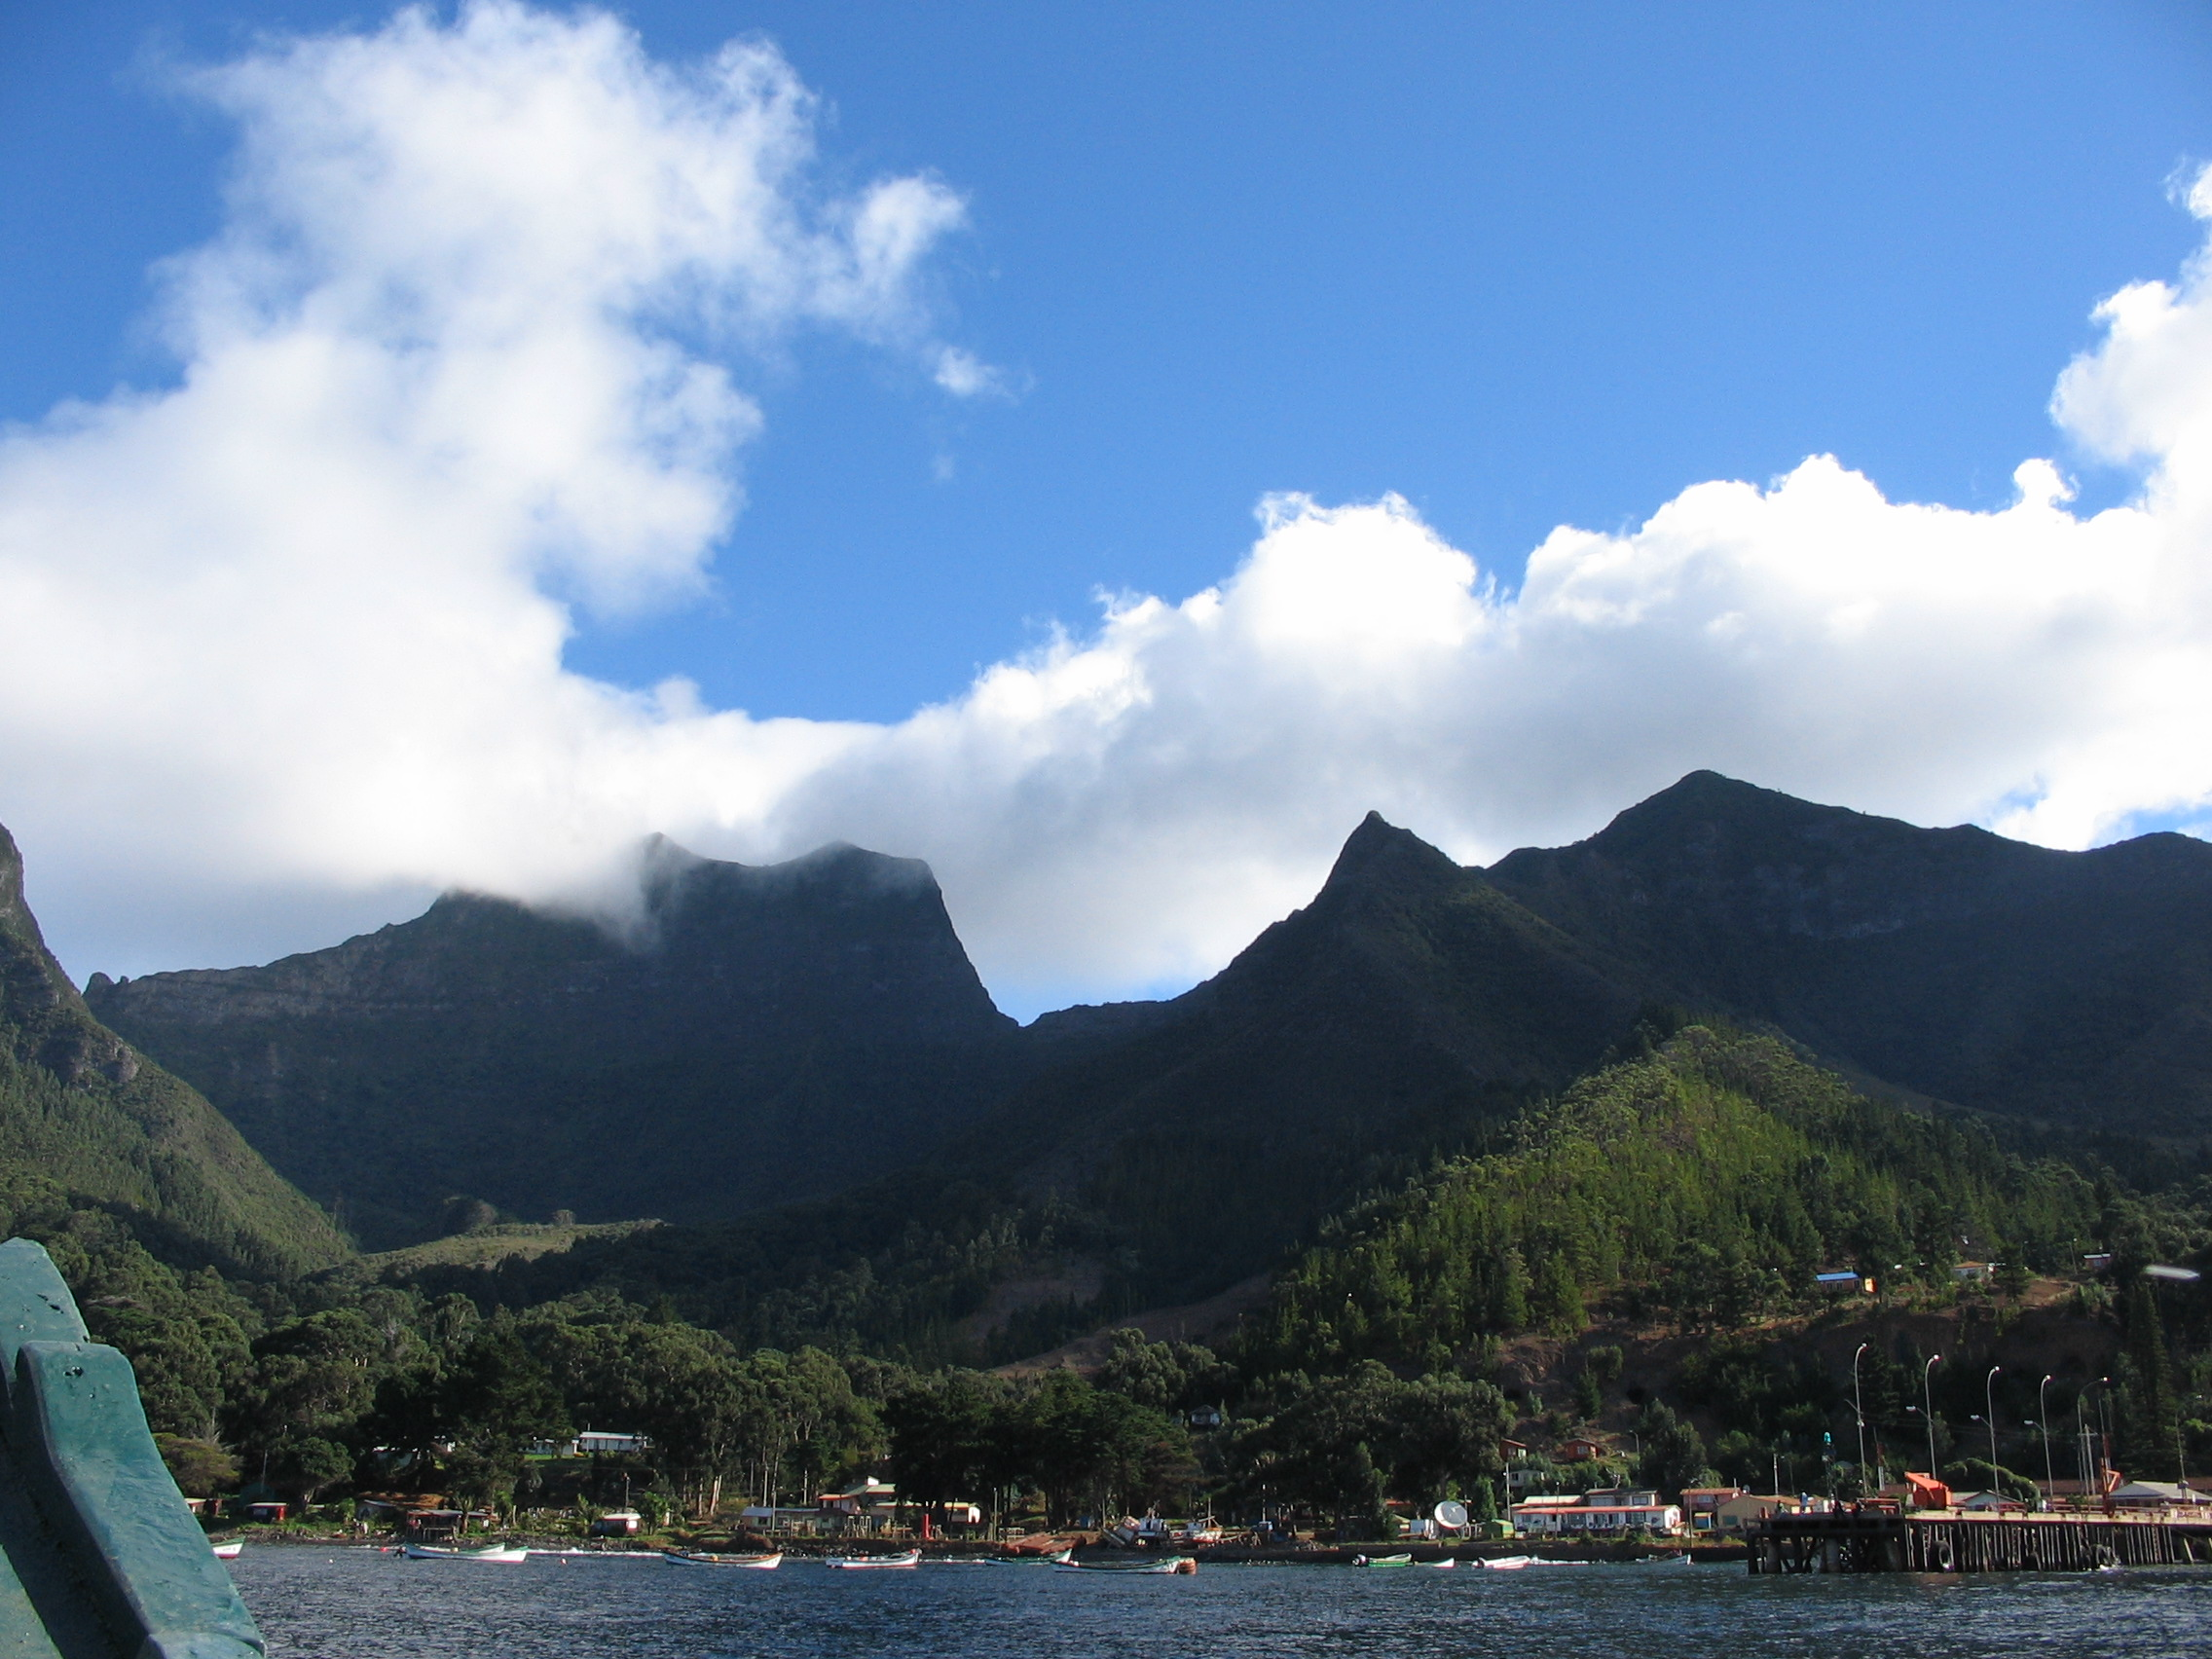 Robinson Crusoe Island, Chile's own hidden gem. Source: Wikimedia